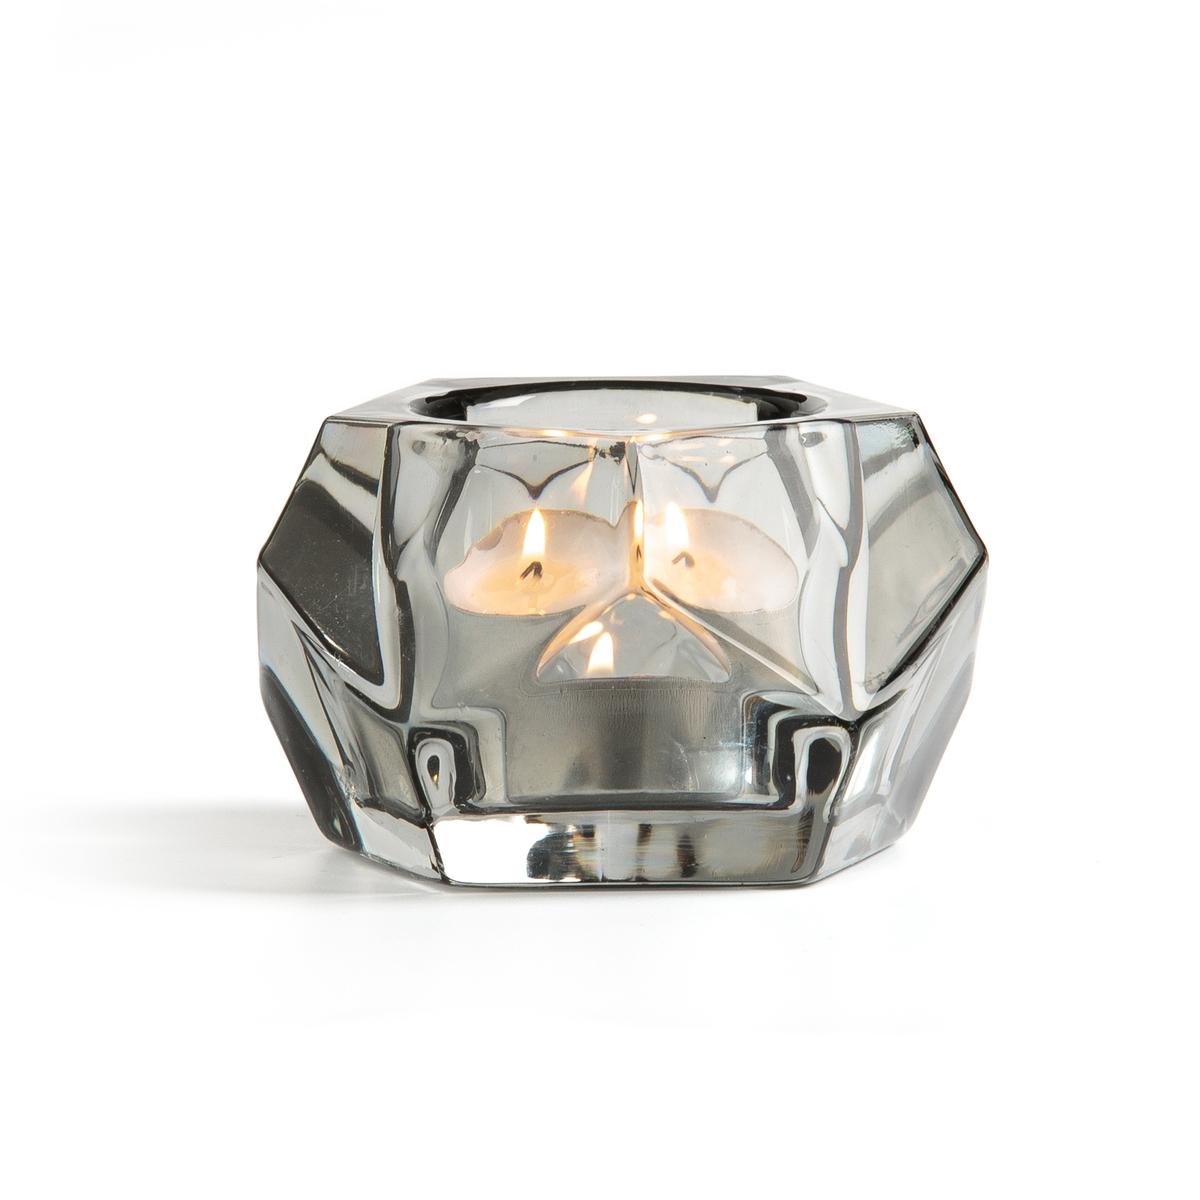 Porta-candela DIAMONE